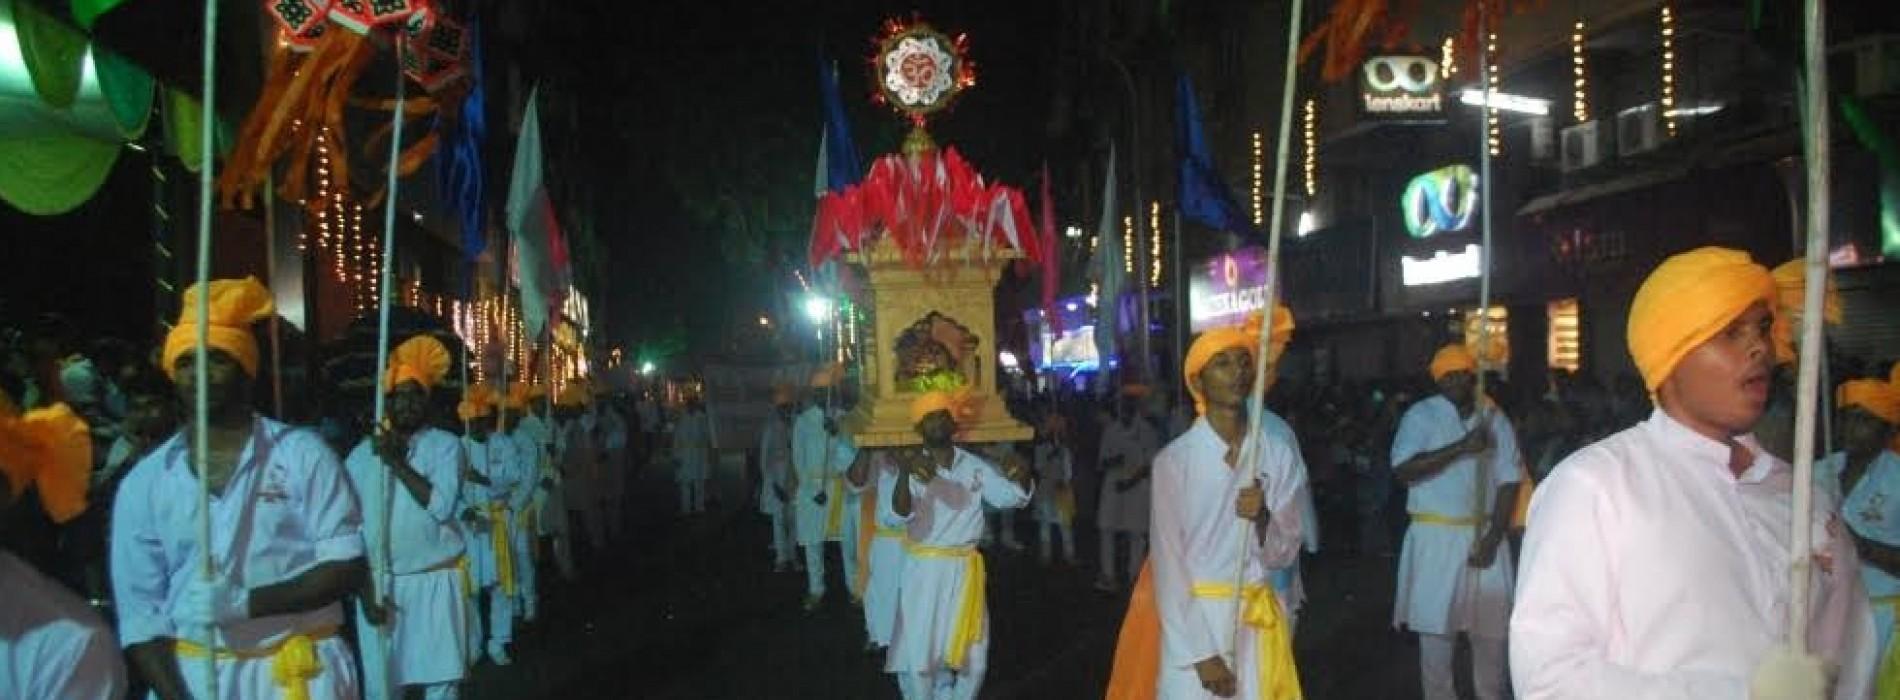 Shigmo festivities to begin in Goa from March 14 – 27, 2017